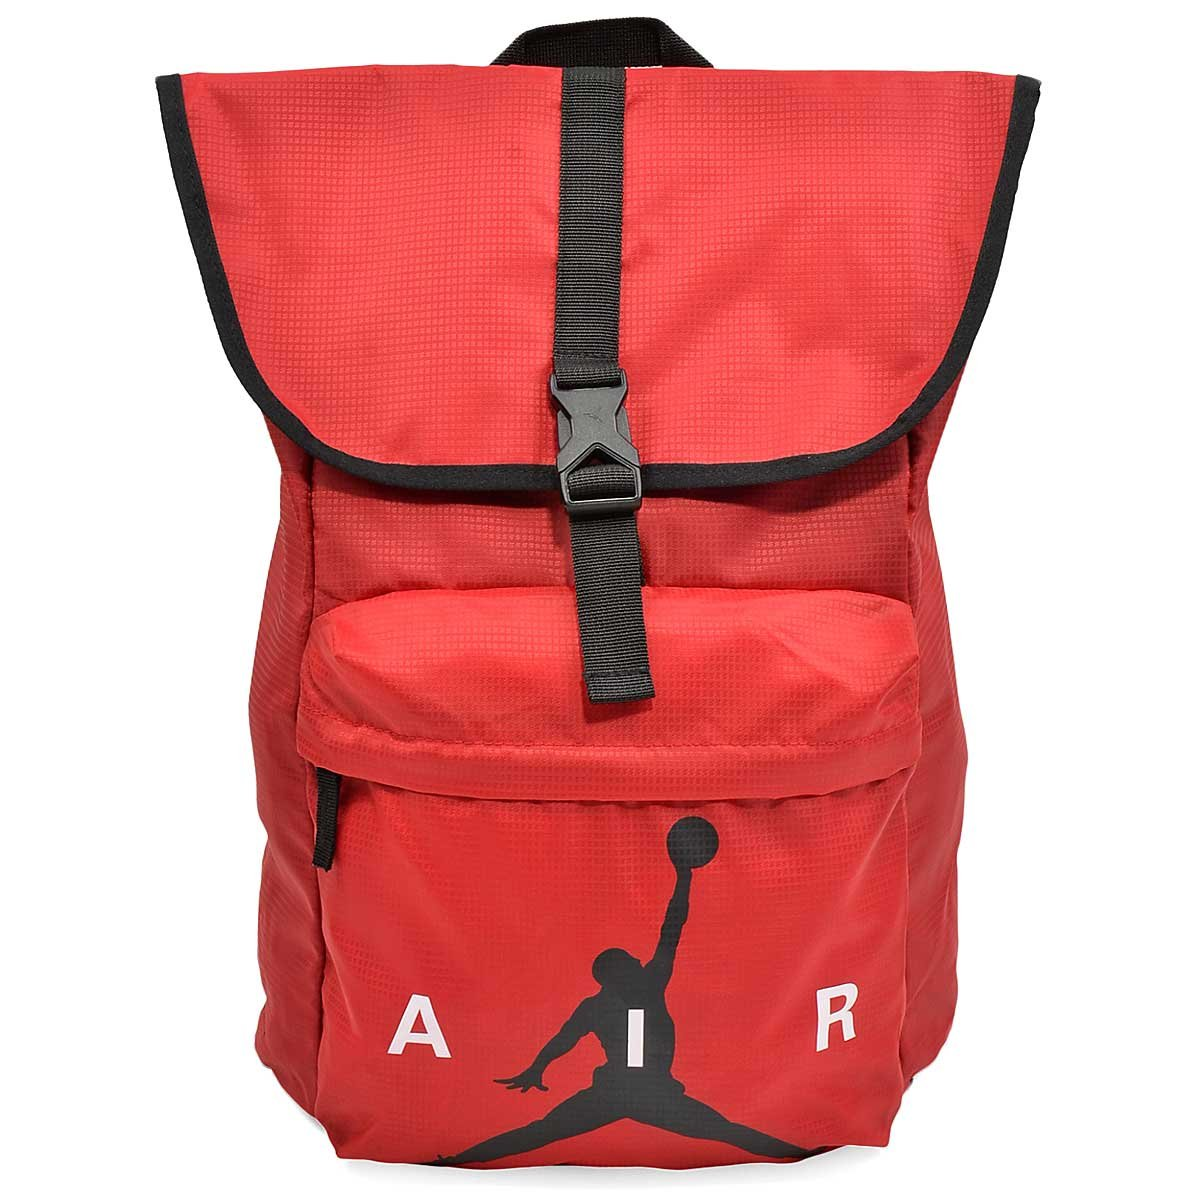 Nike Air Jordan Jumpman 9 a1725-r78トレーニングDayバックパックブックバッグジムレッド/ブラック, O/S   B01MZ0BOTO